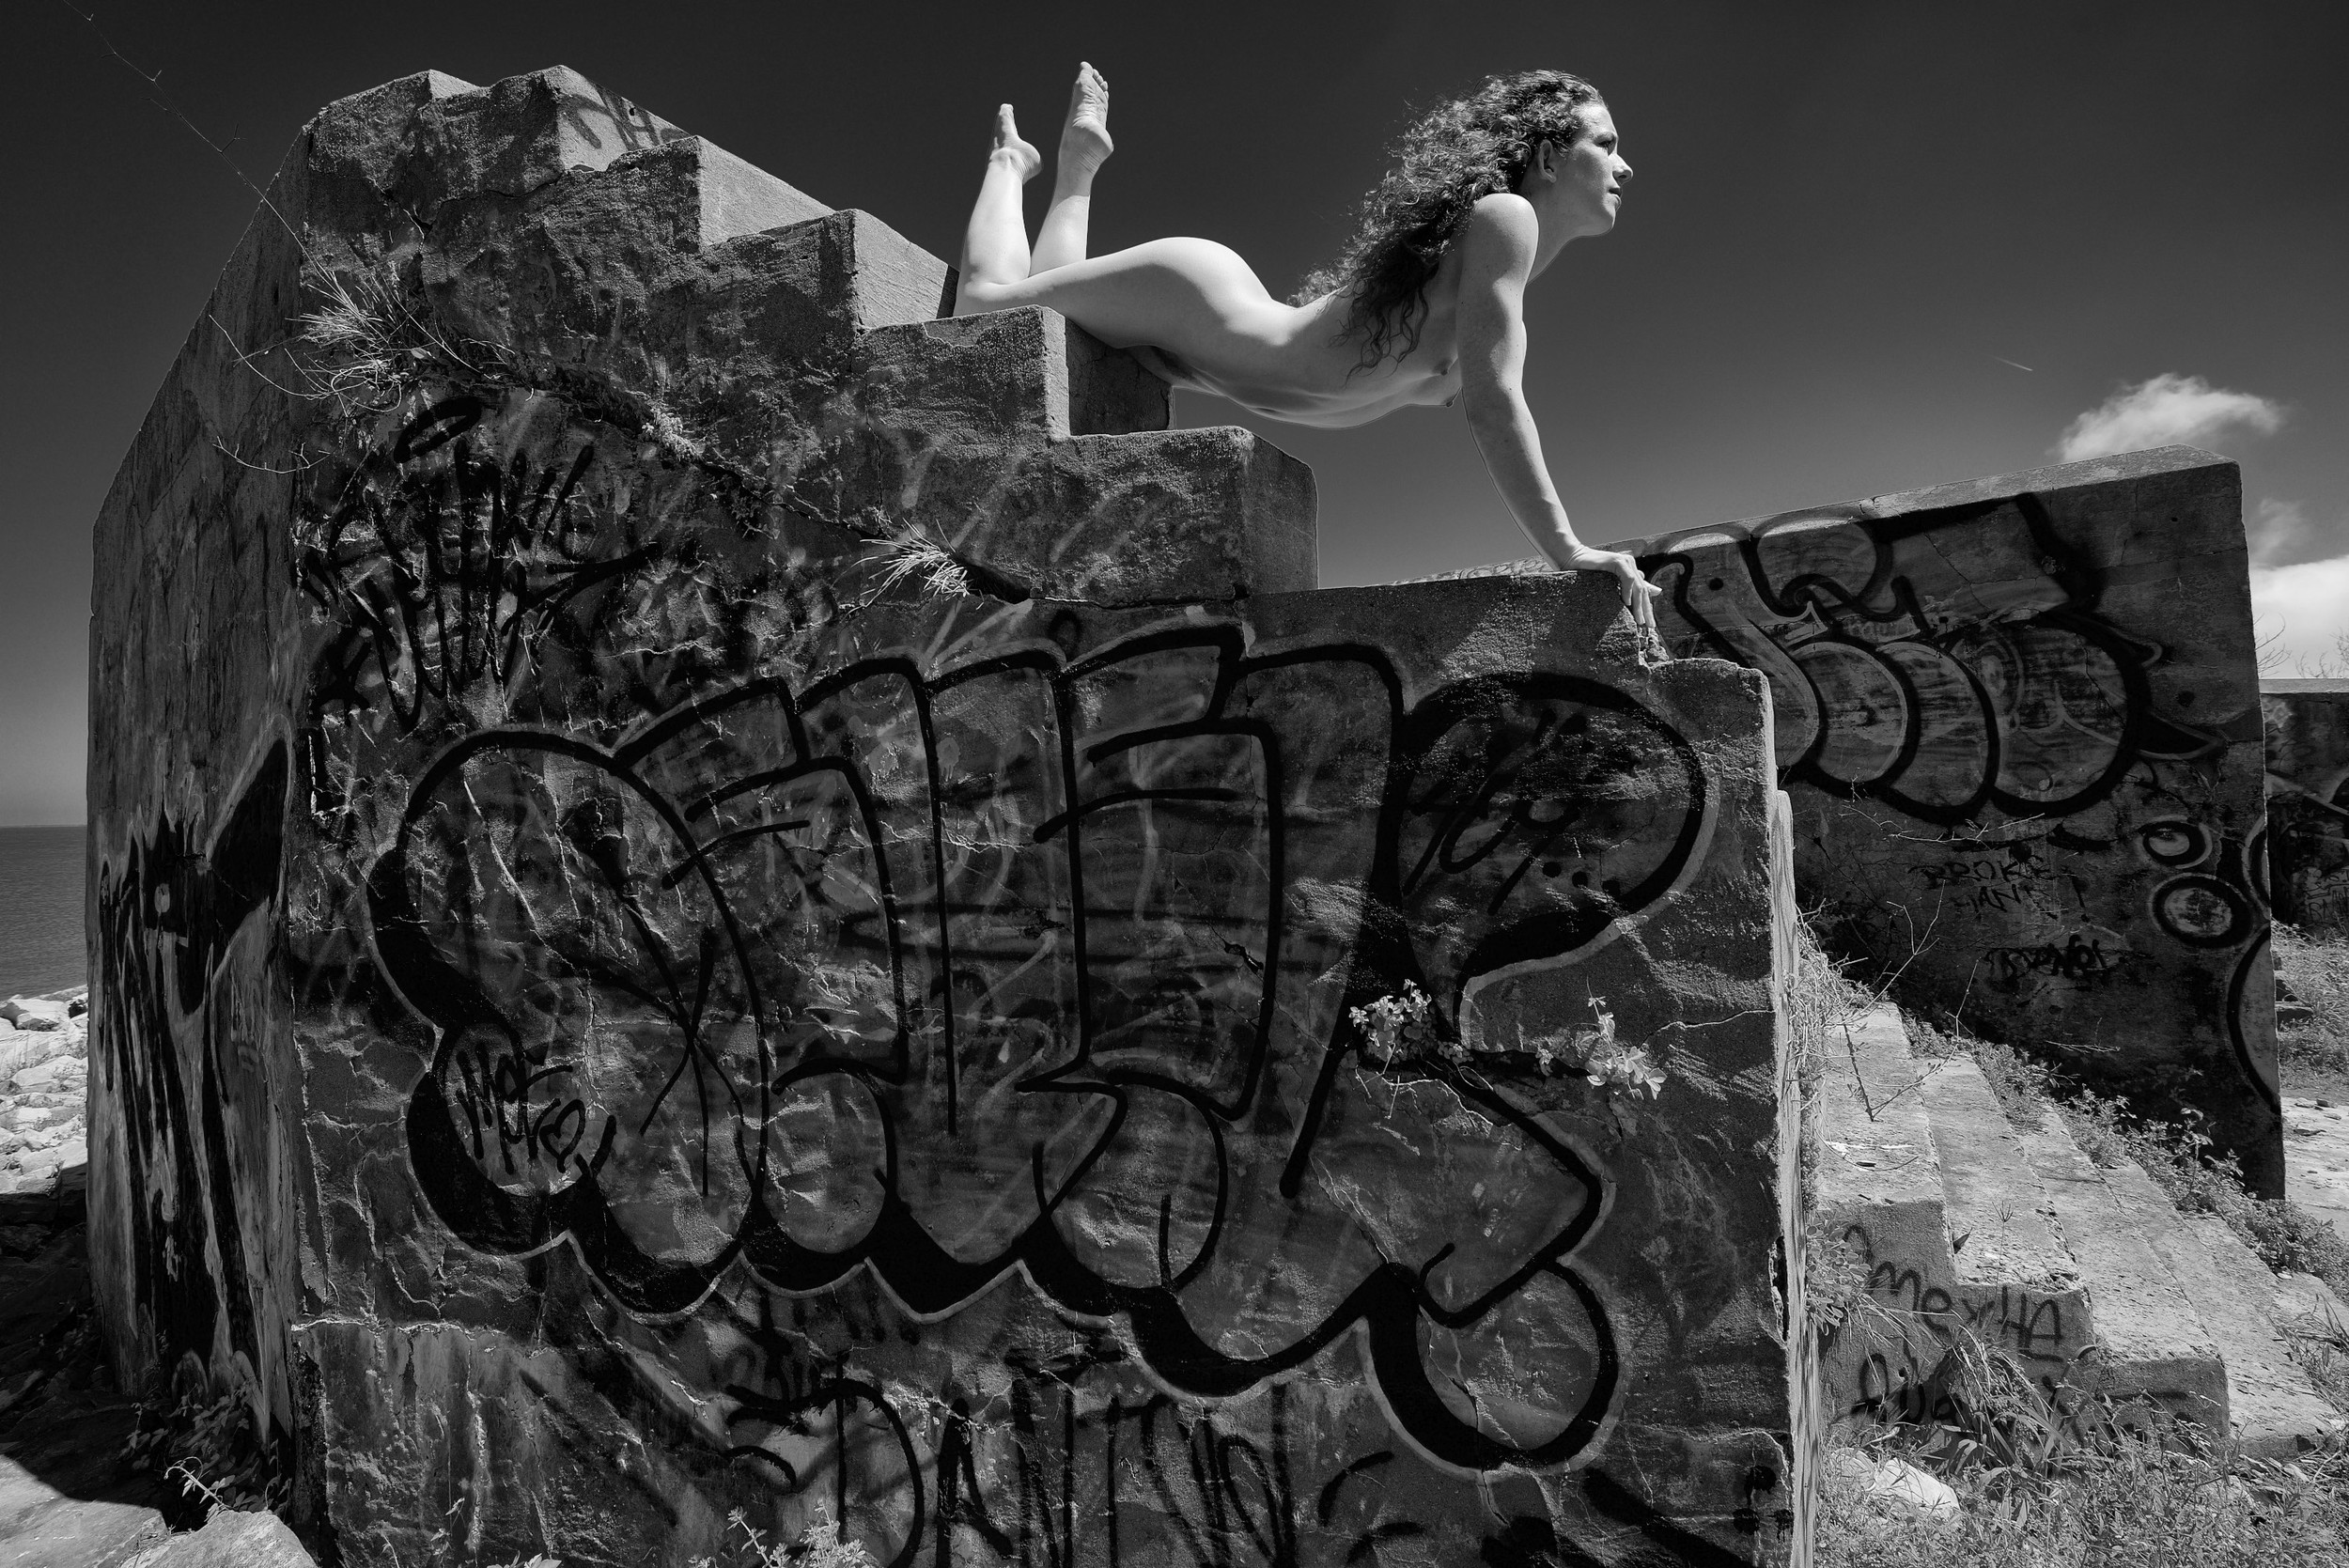 Mermaidscape